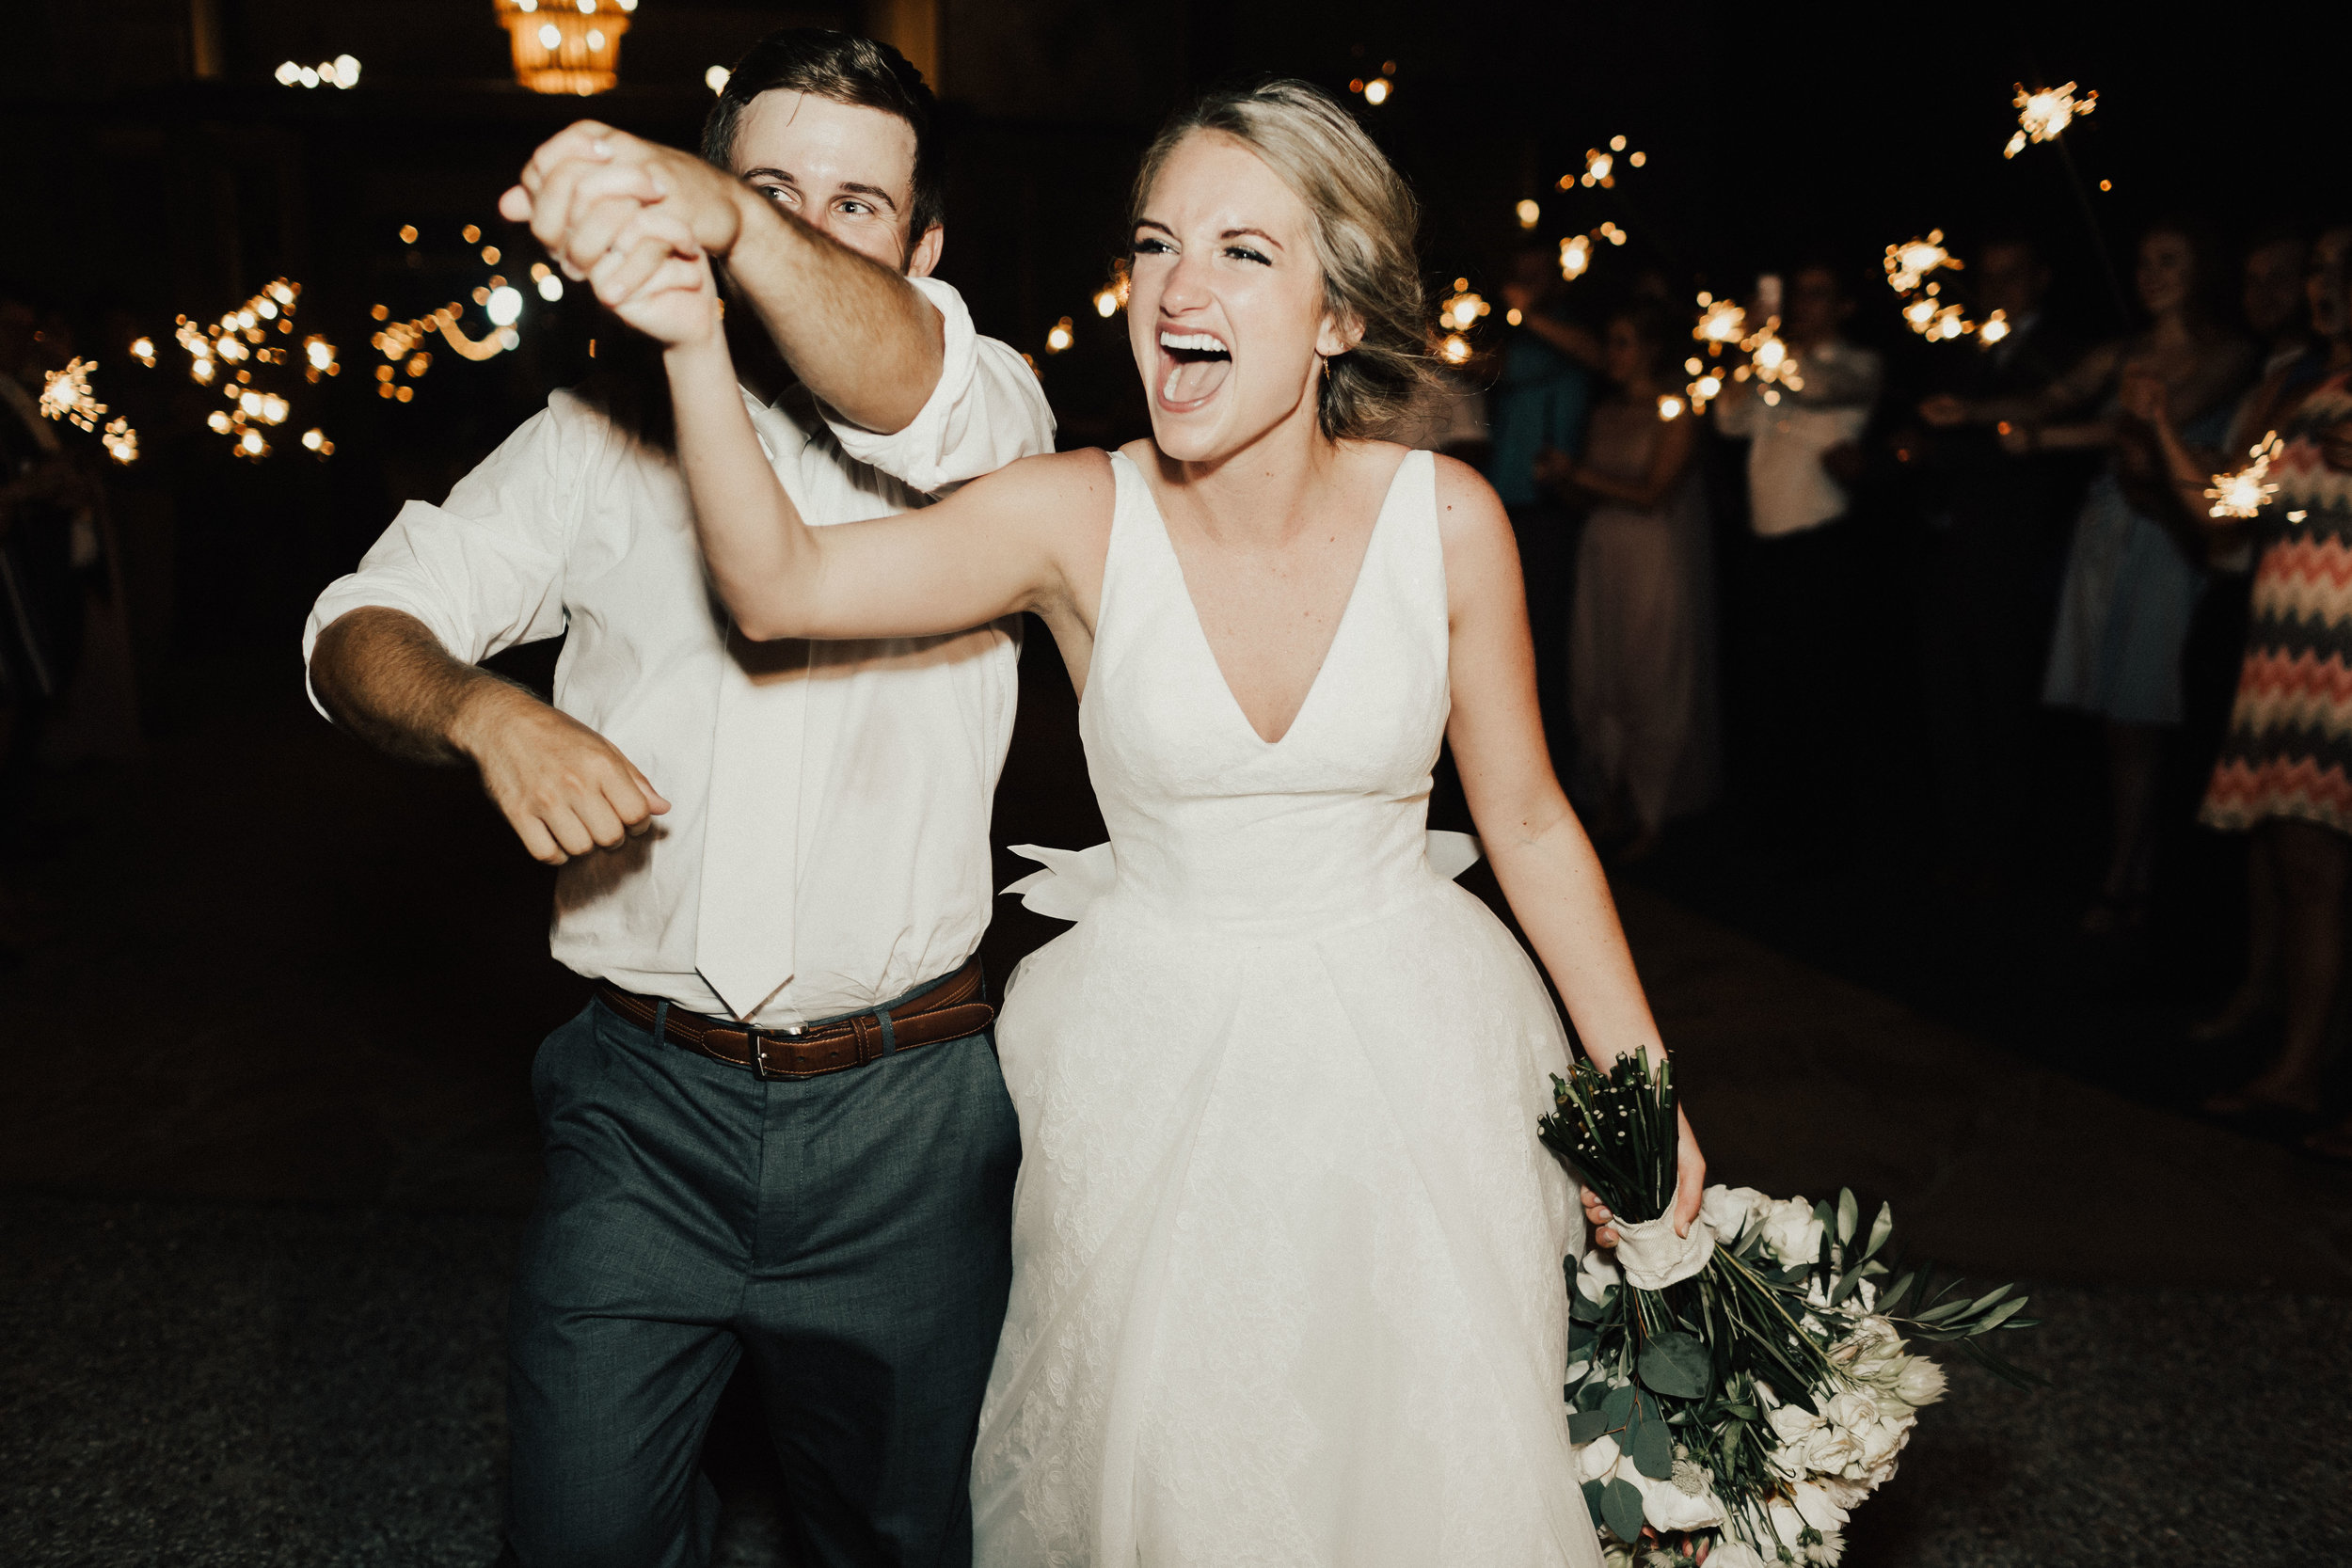 lauren-harrison-wedding-photographer-pecan-springs-ranch-austin-texas--967.jpg